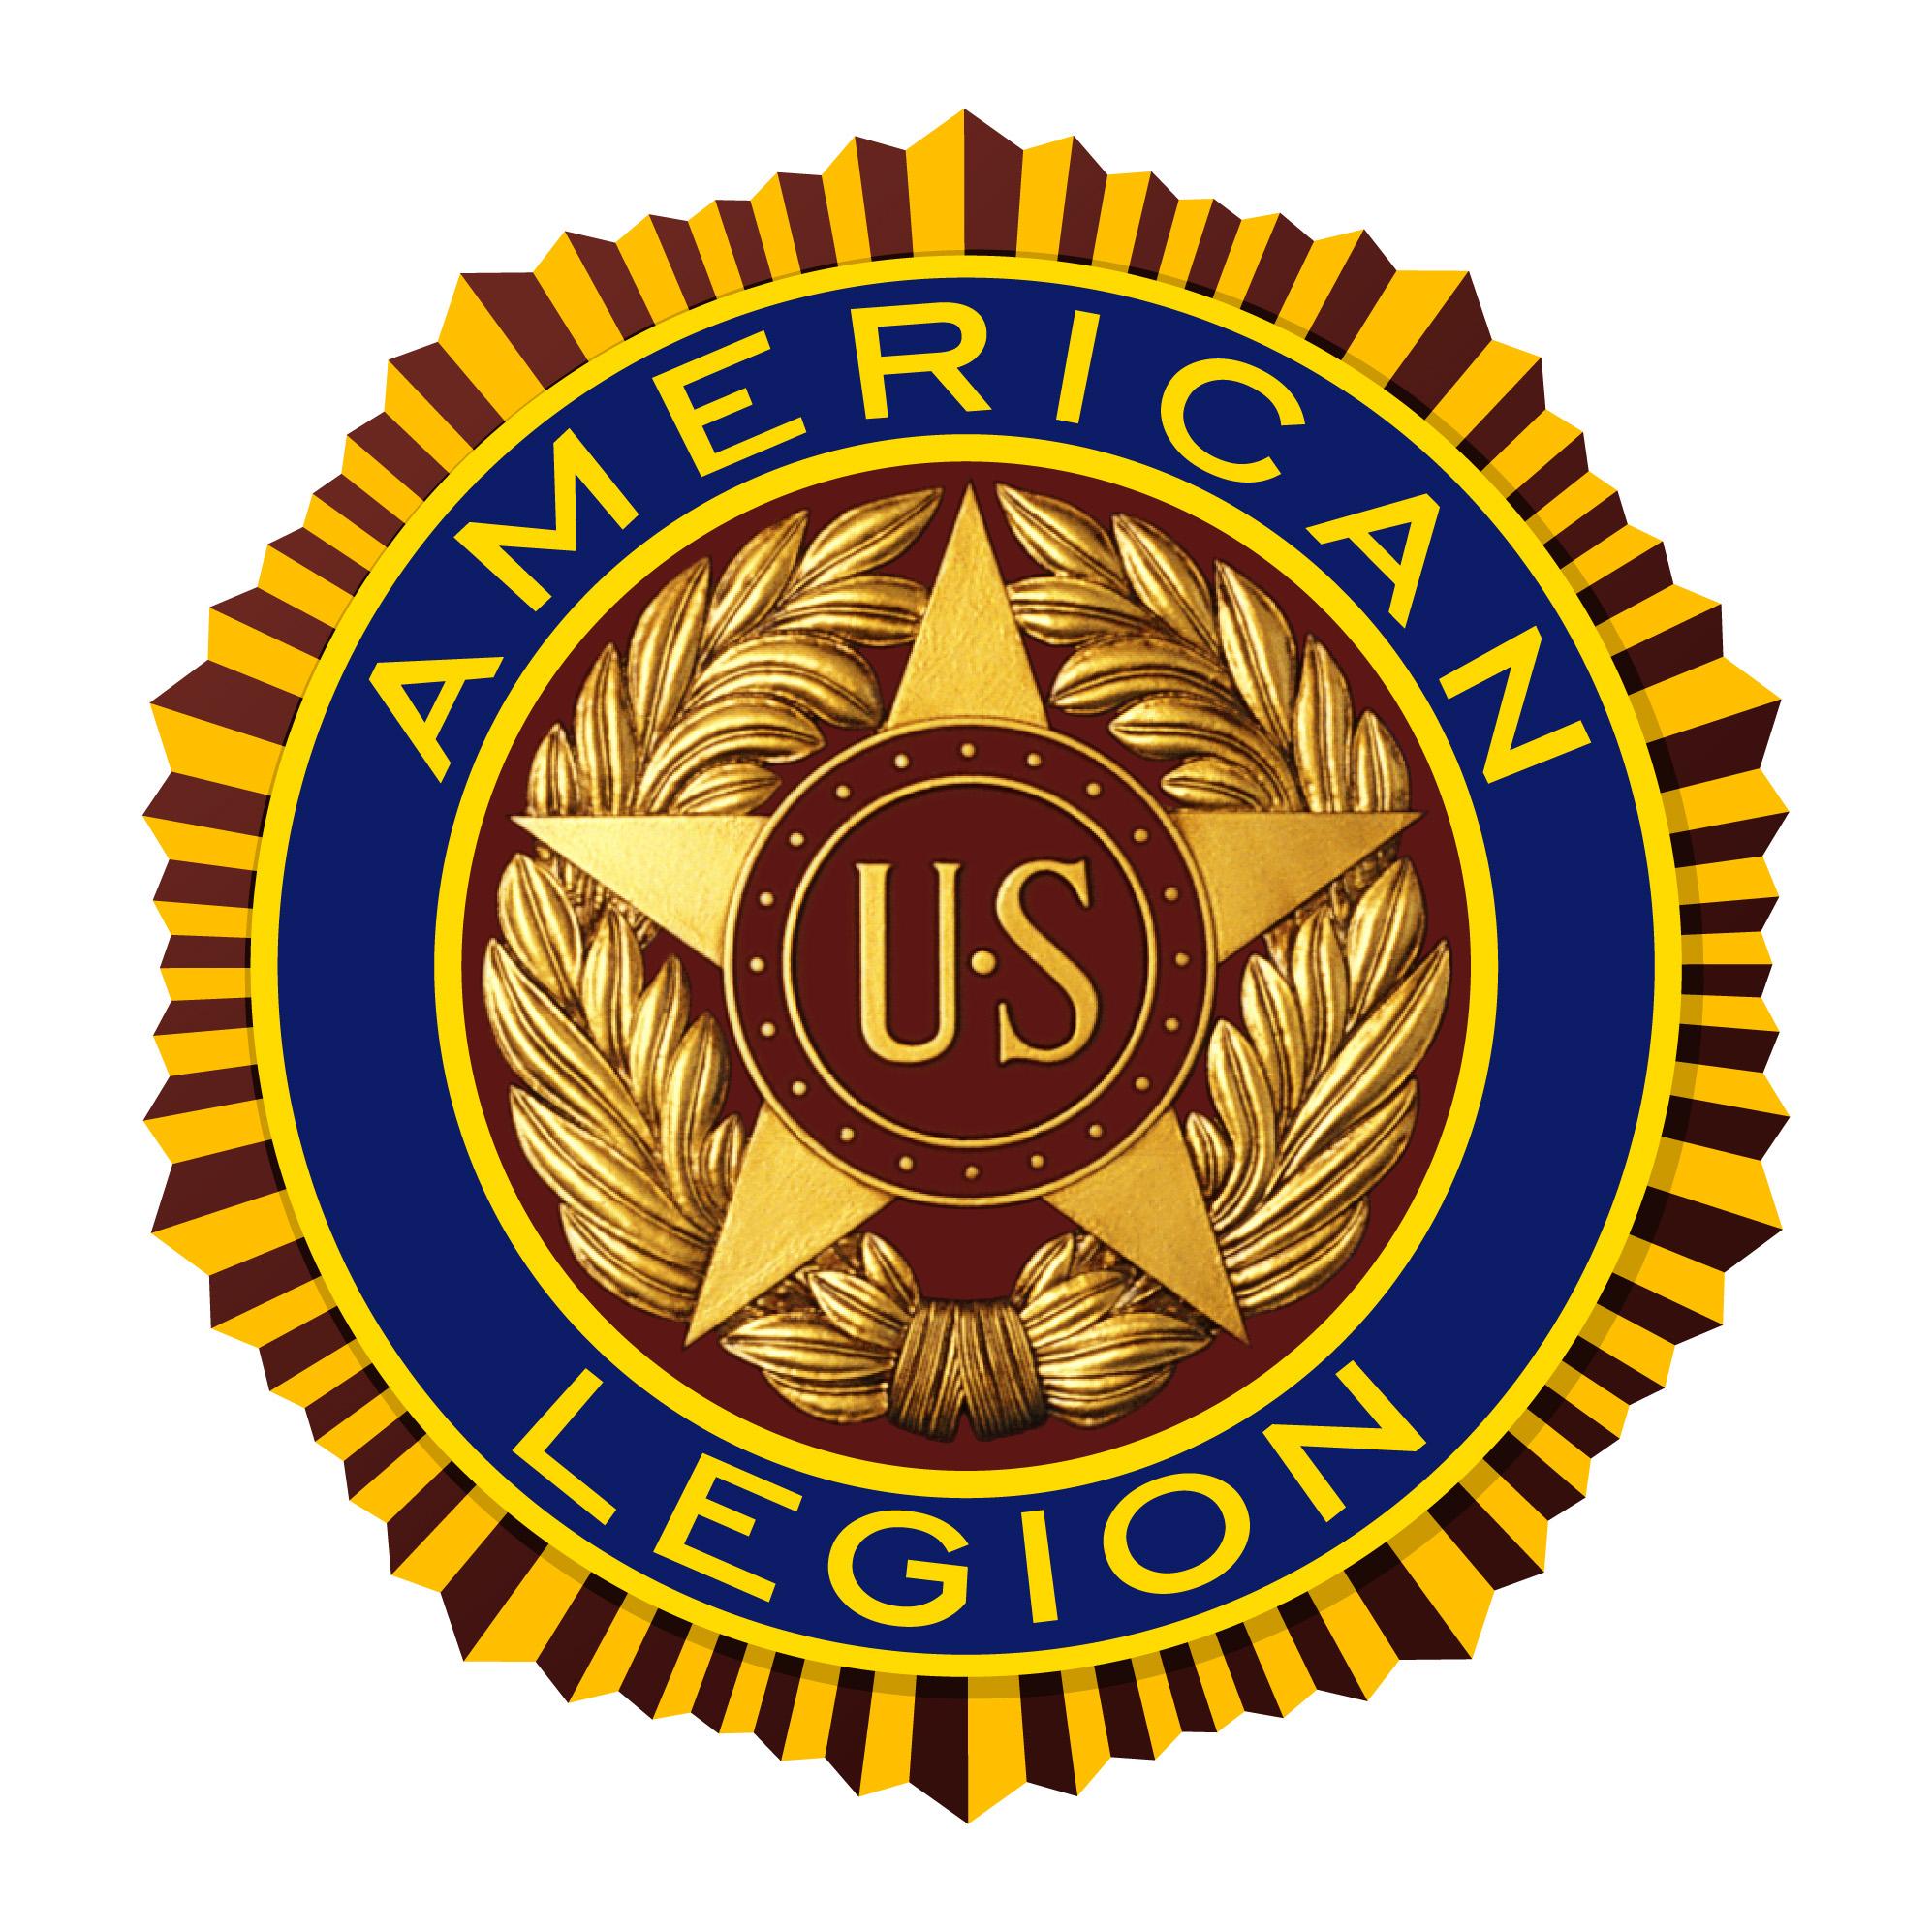 American Legion Logo PNG-PlusPNG pluspng.com-1994 - American Legion Logo PNG - American Legion Vector PNG